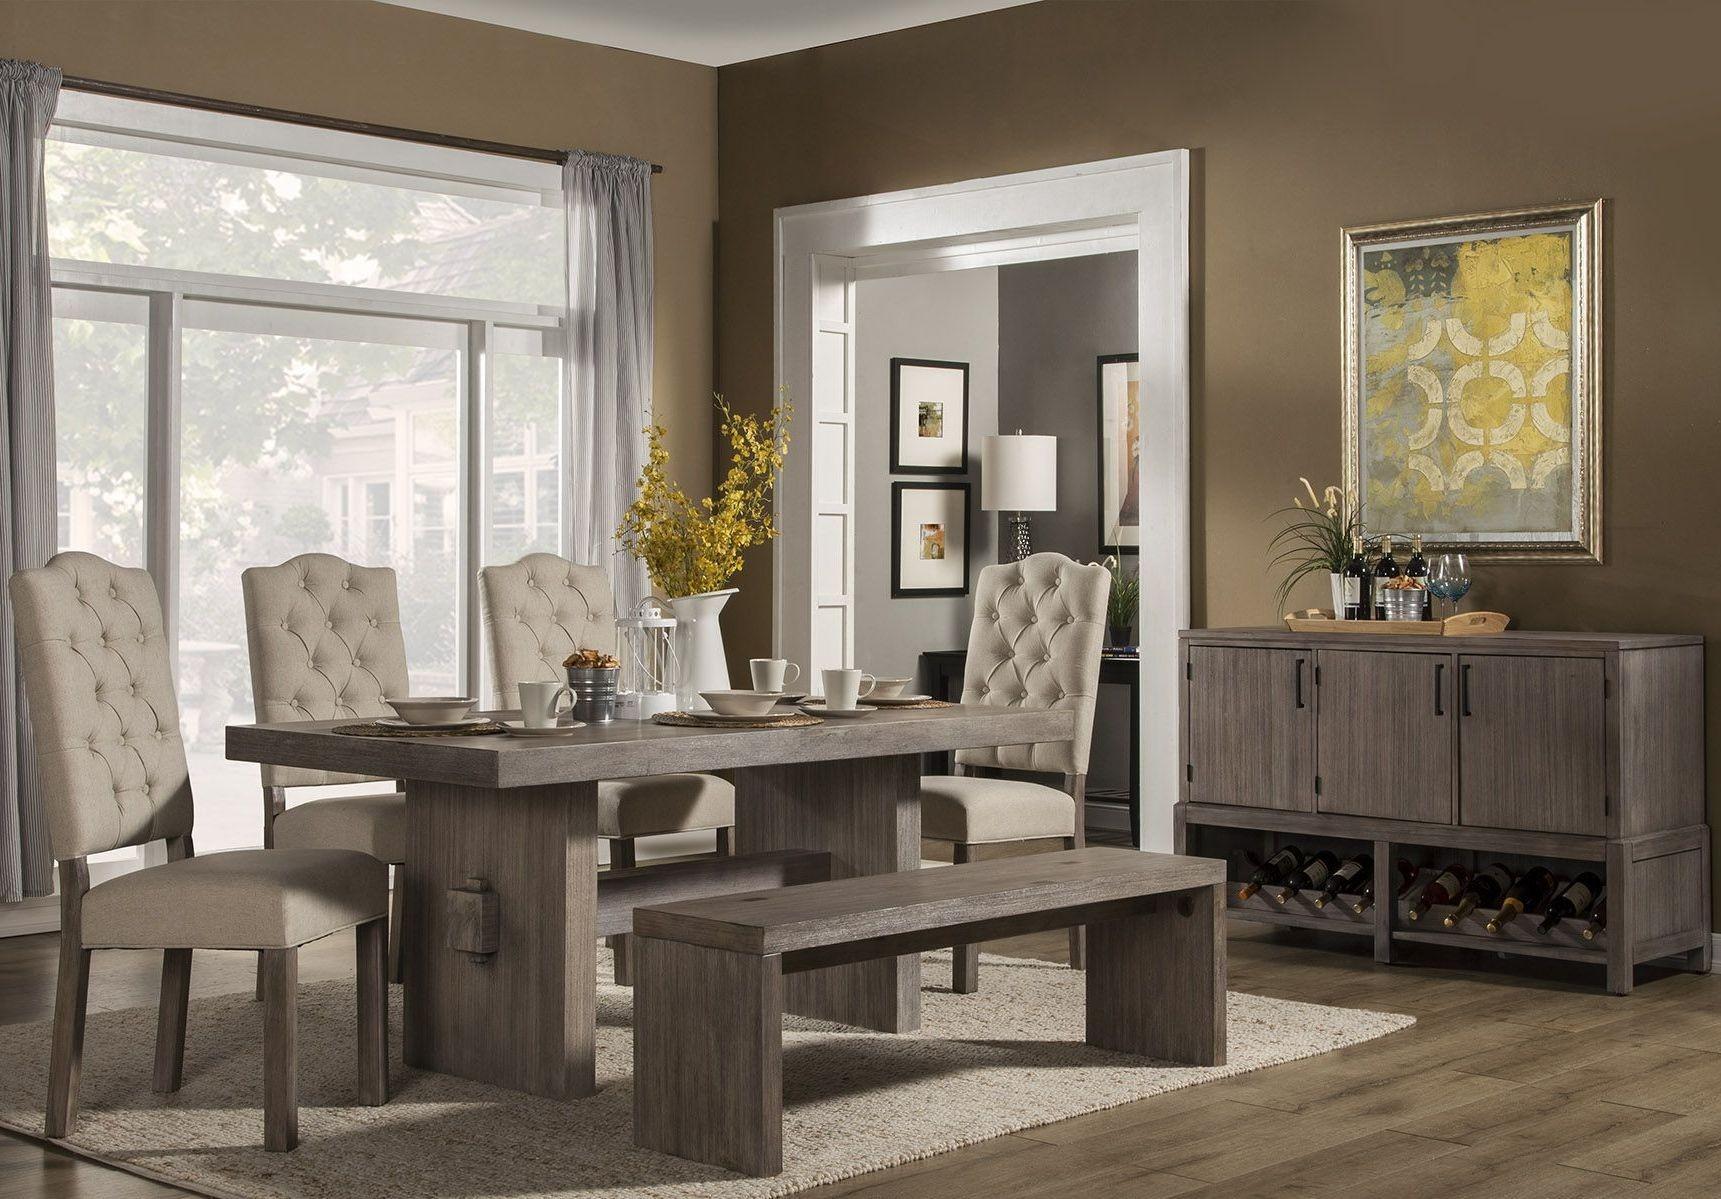 Fiji Grey Dining Room Set From Alpine Coleman Furniture